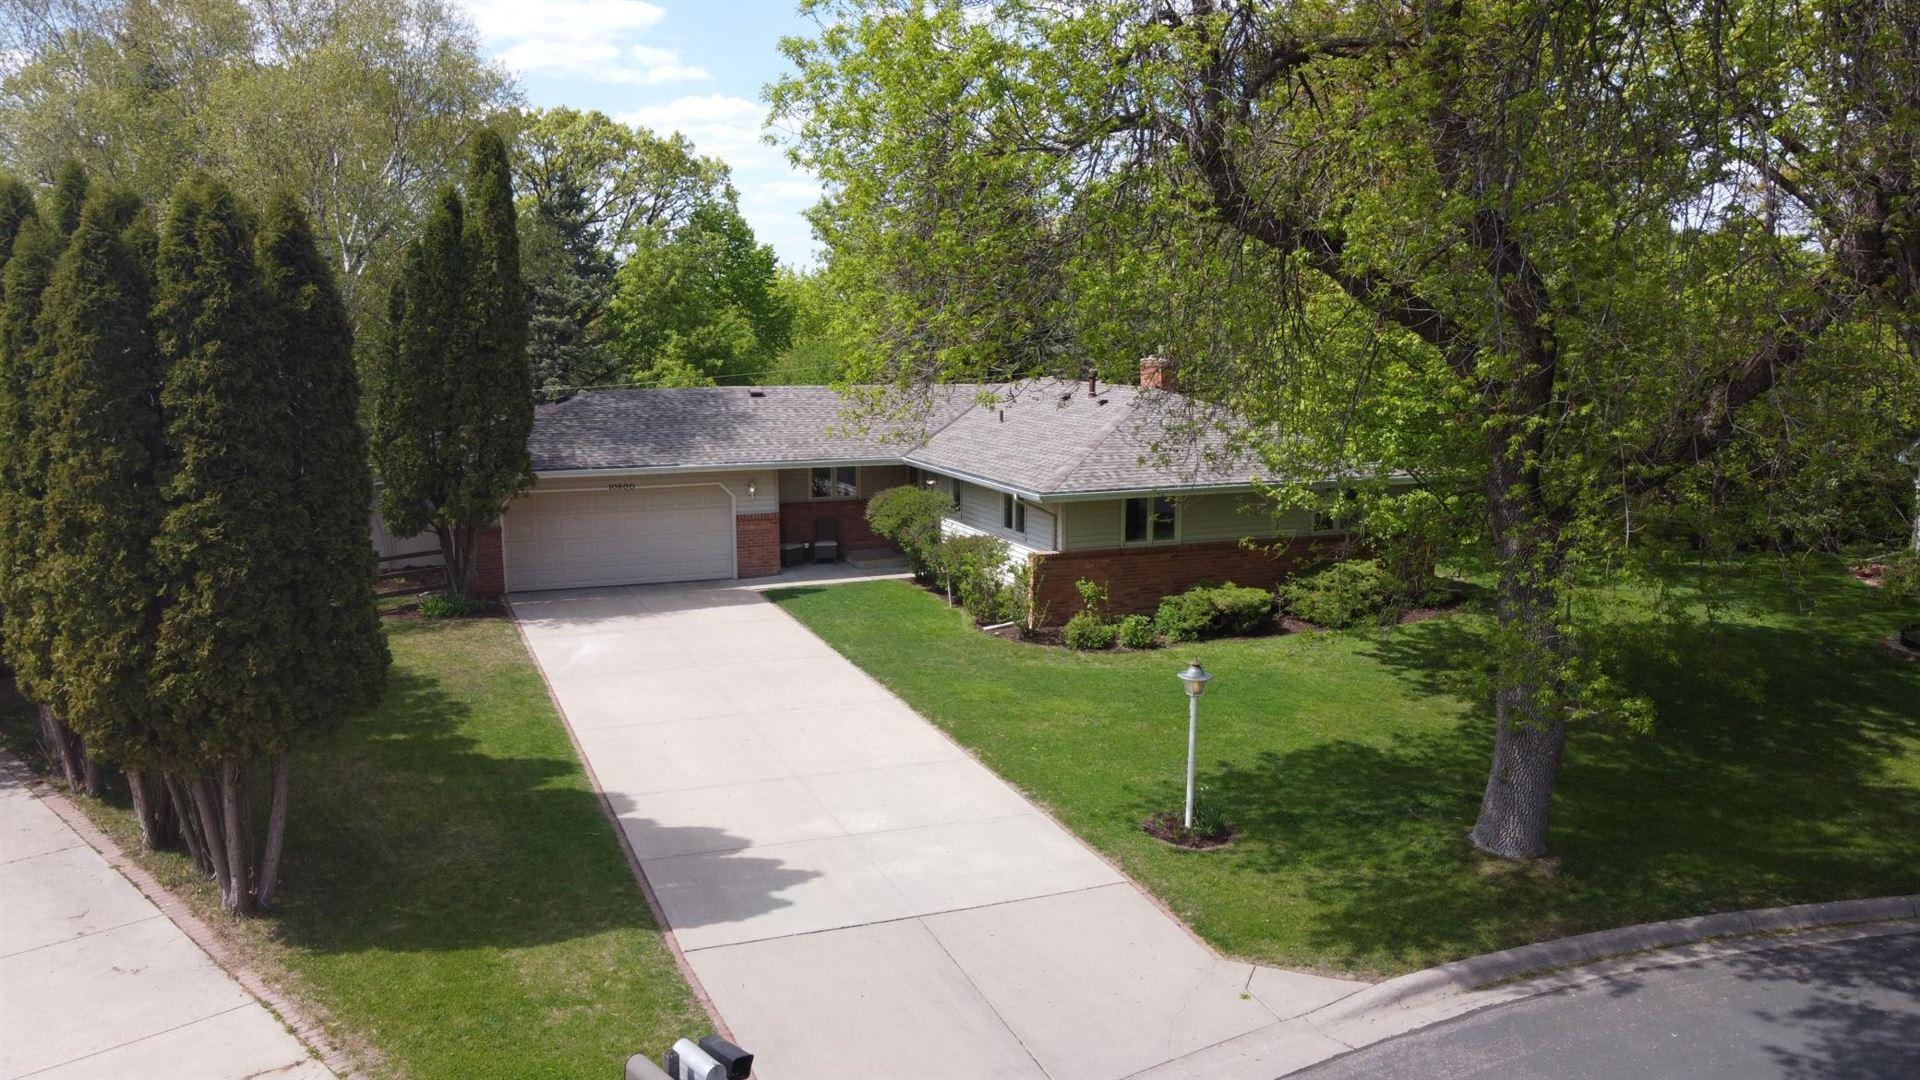 Photo of 10800 Hayes Drive, Burnsville, MN 55337 (MLS # 5758548)